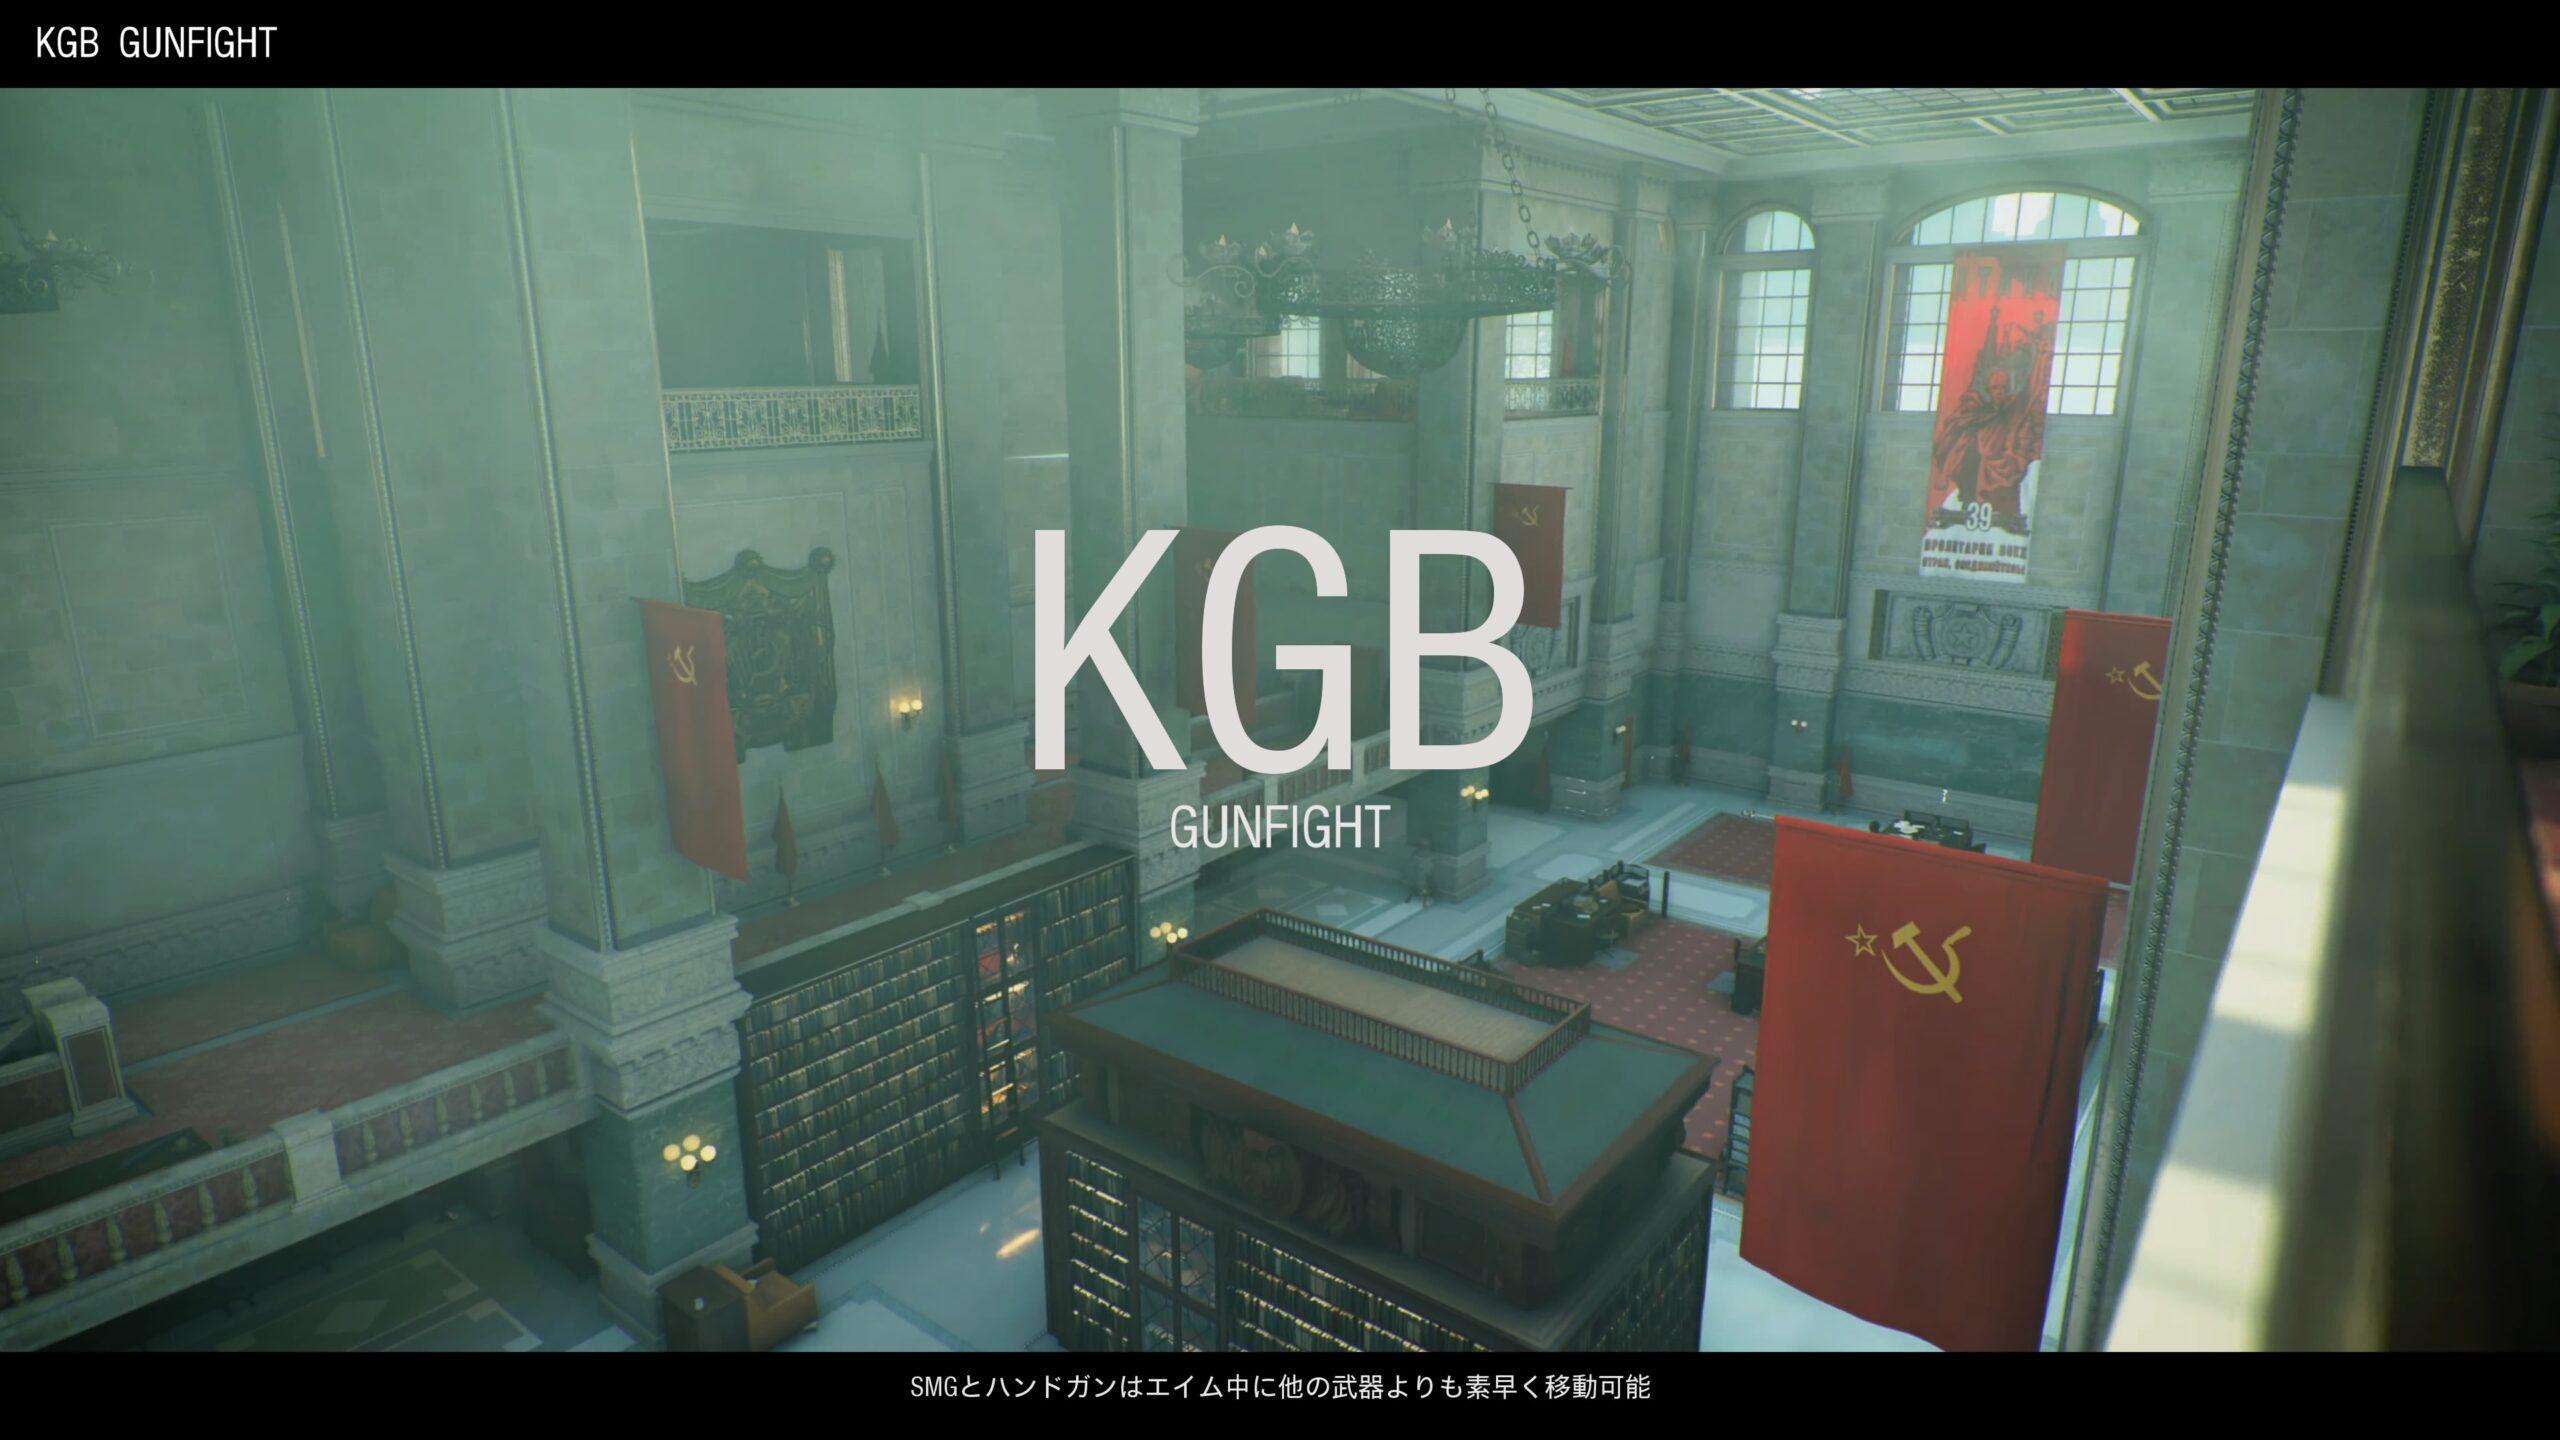 KGB-image